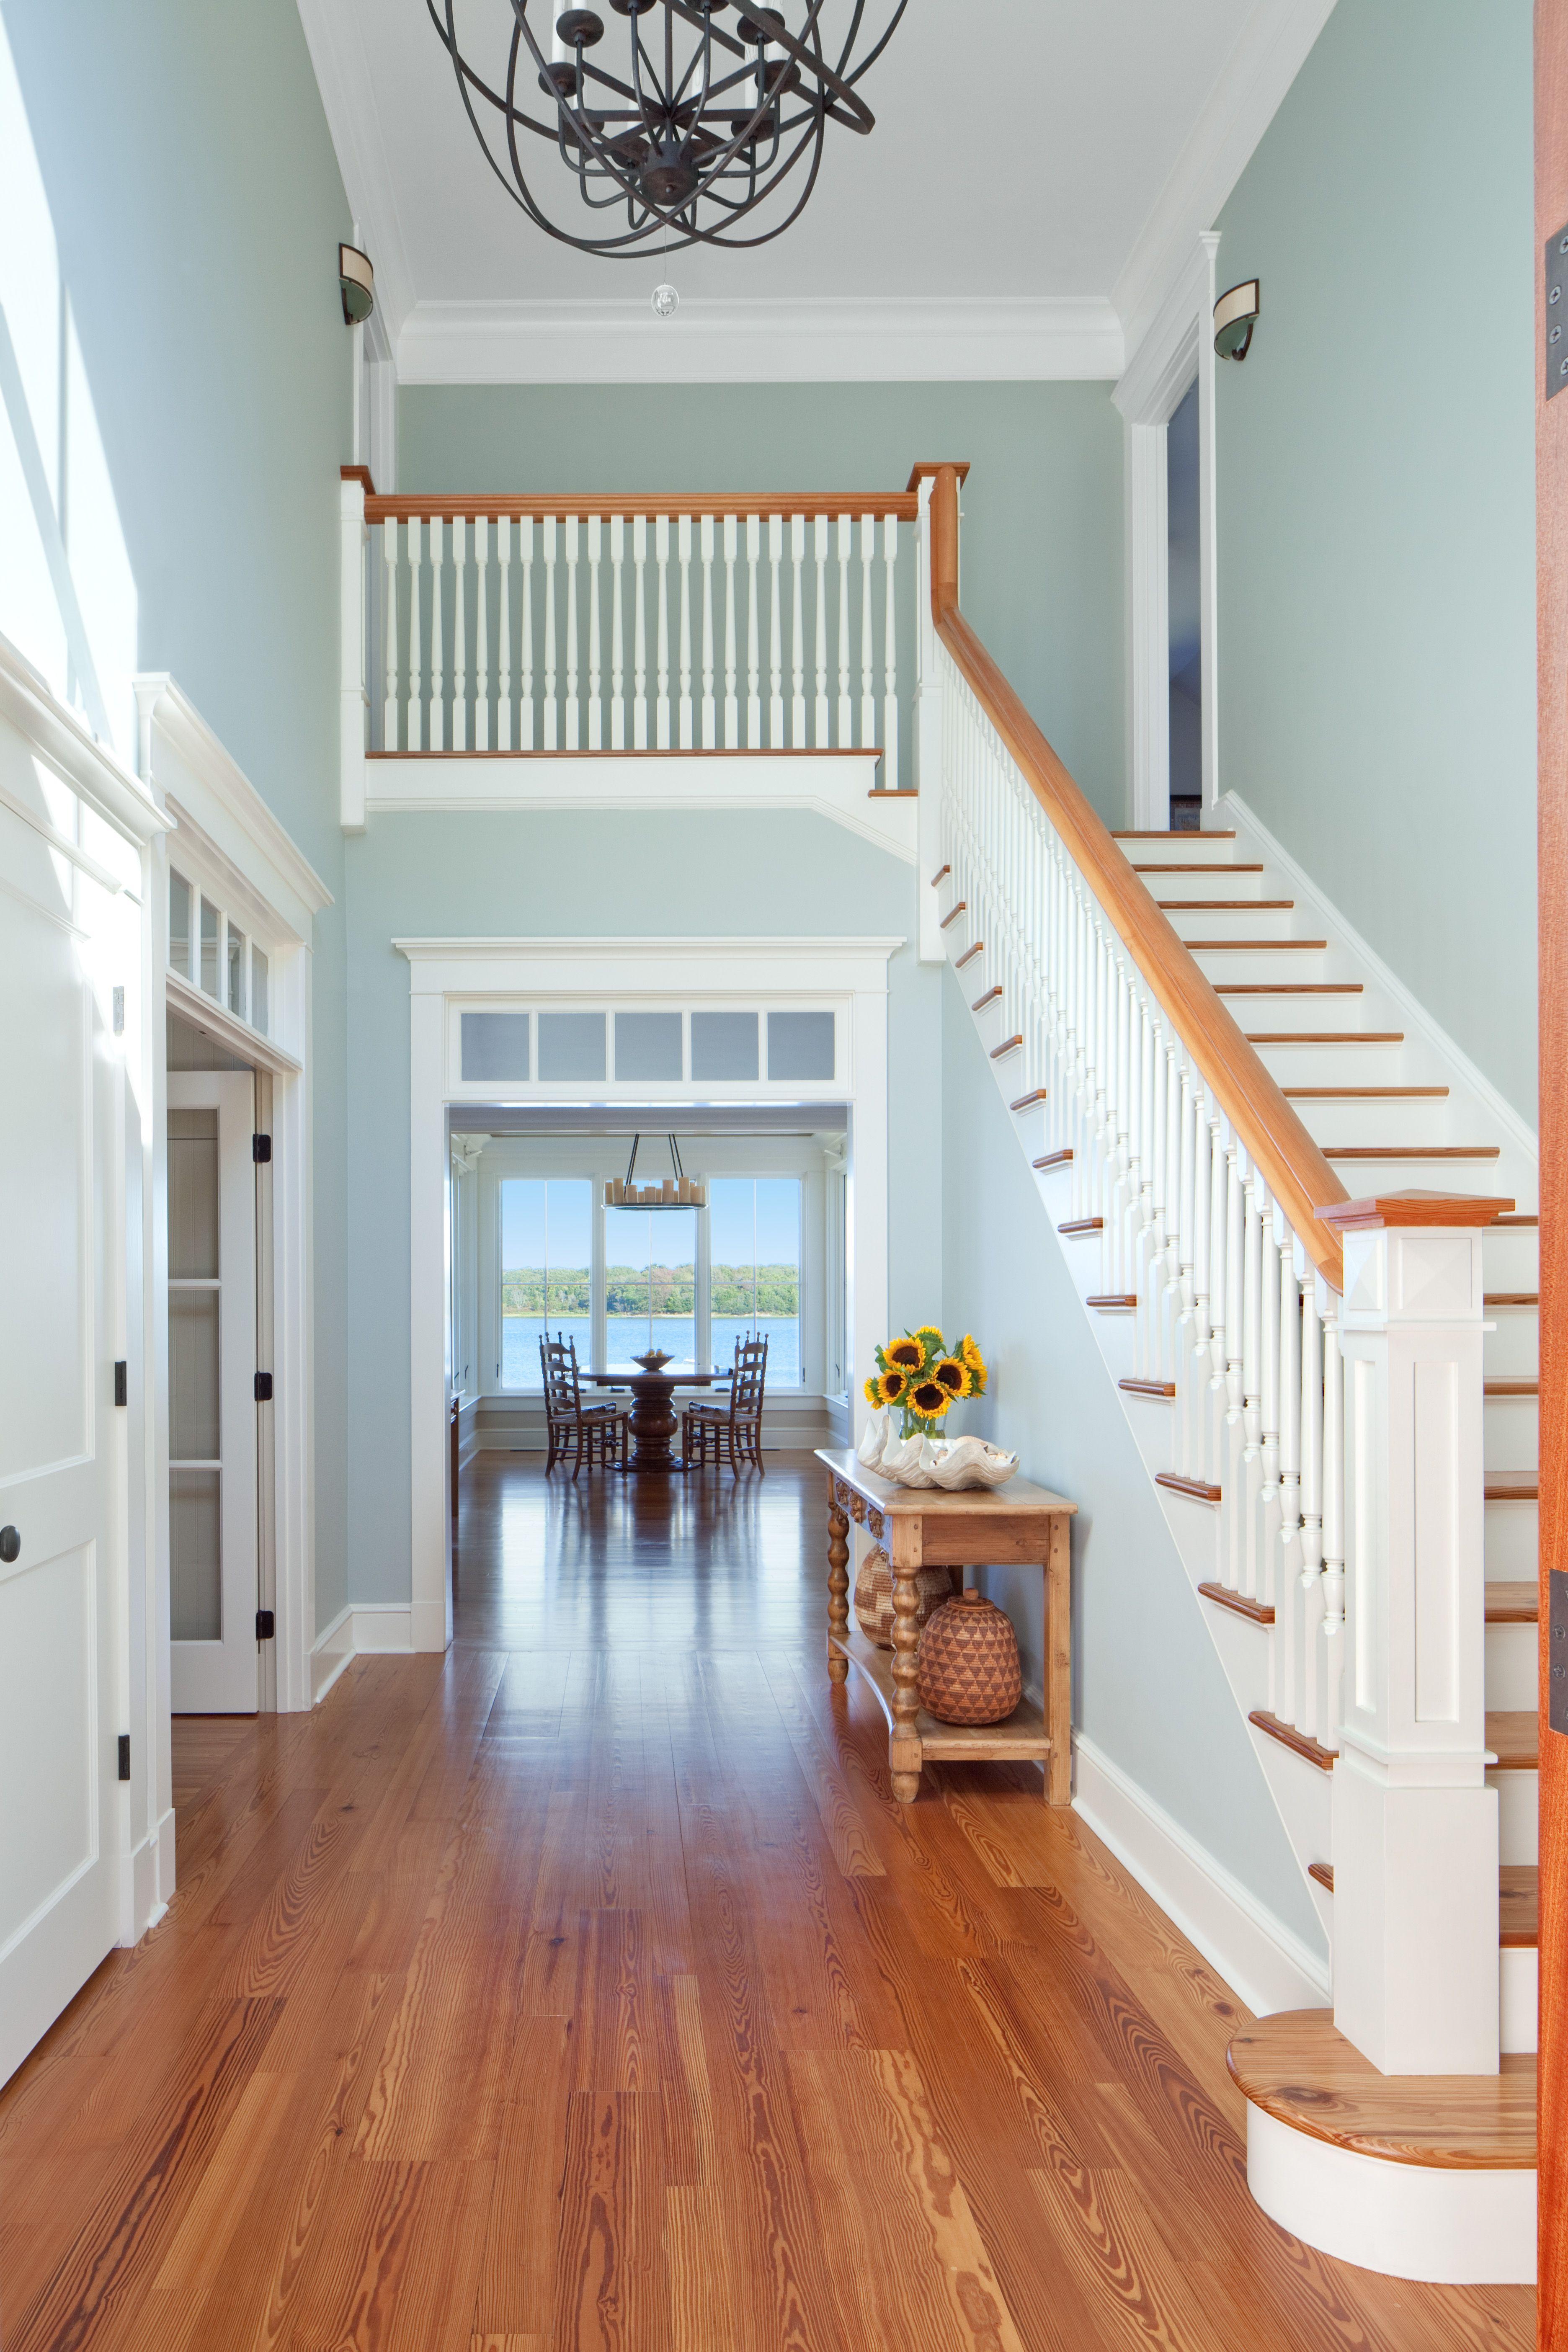 stair hall beach house interior paint colors for home on best colors for home interior id=36675